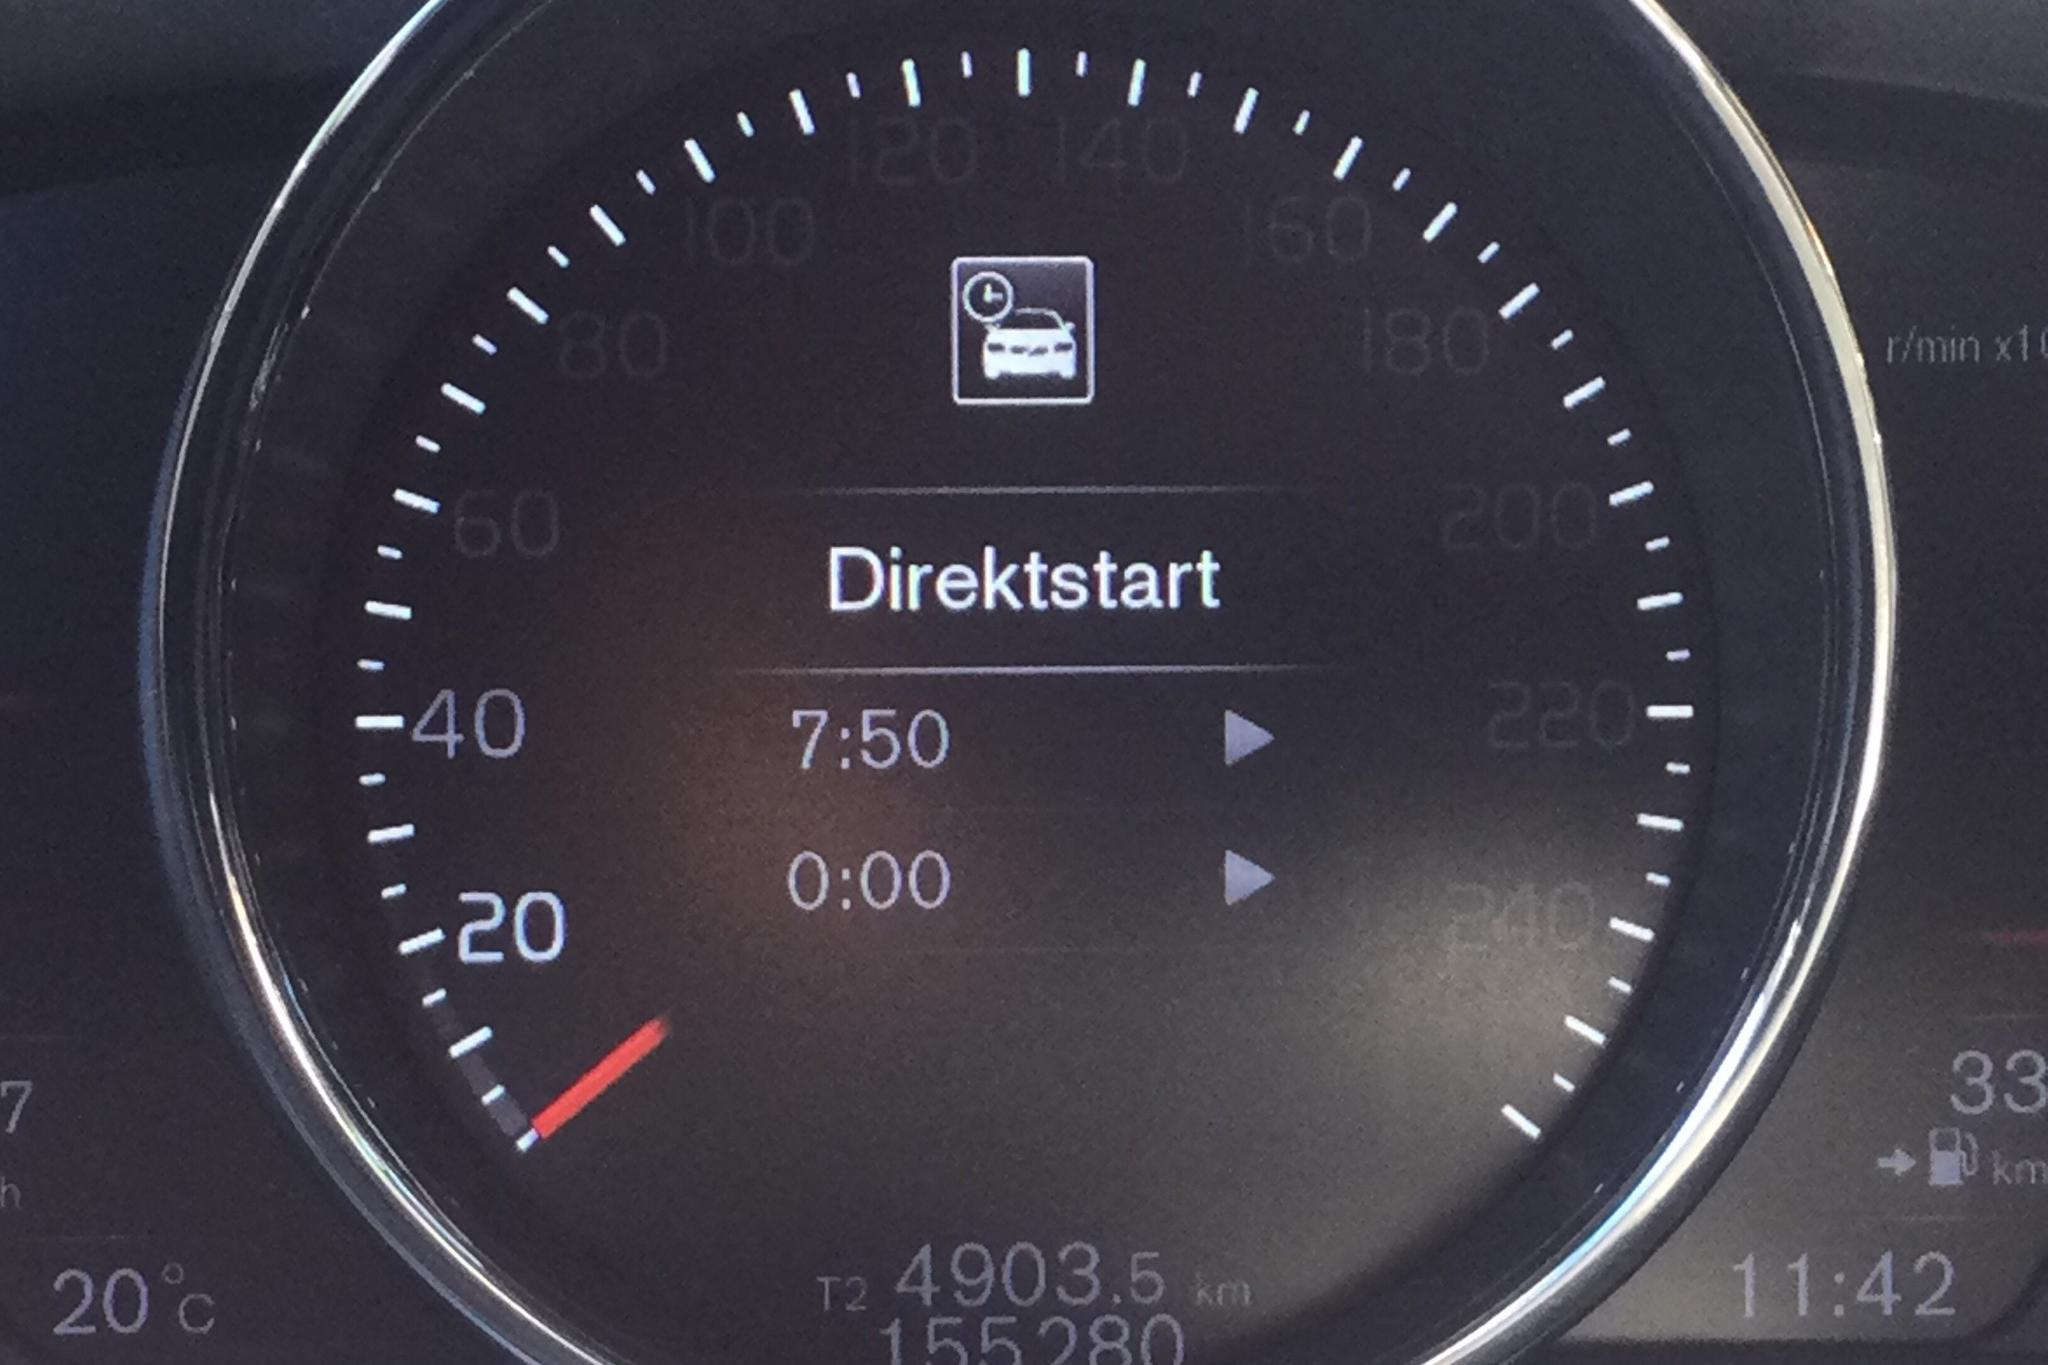 Volvo S60 D4 AWD (190hk) - 15 528 mil - Automat - Light Brown - 2016